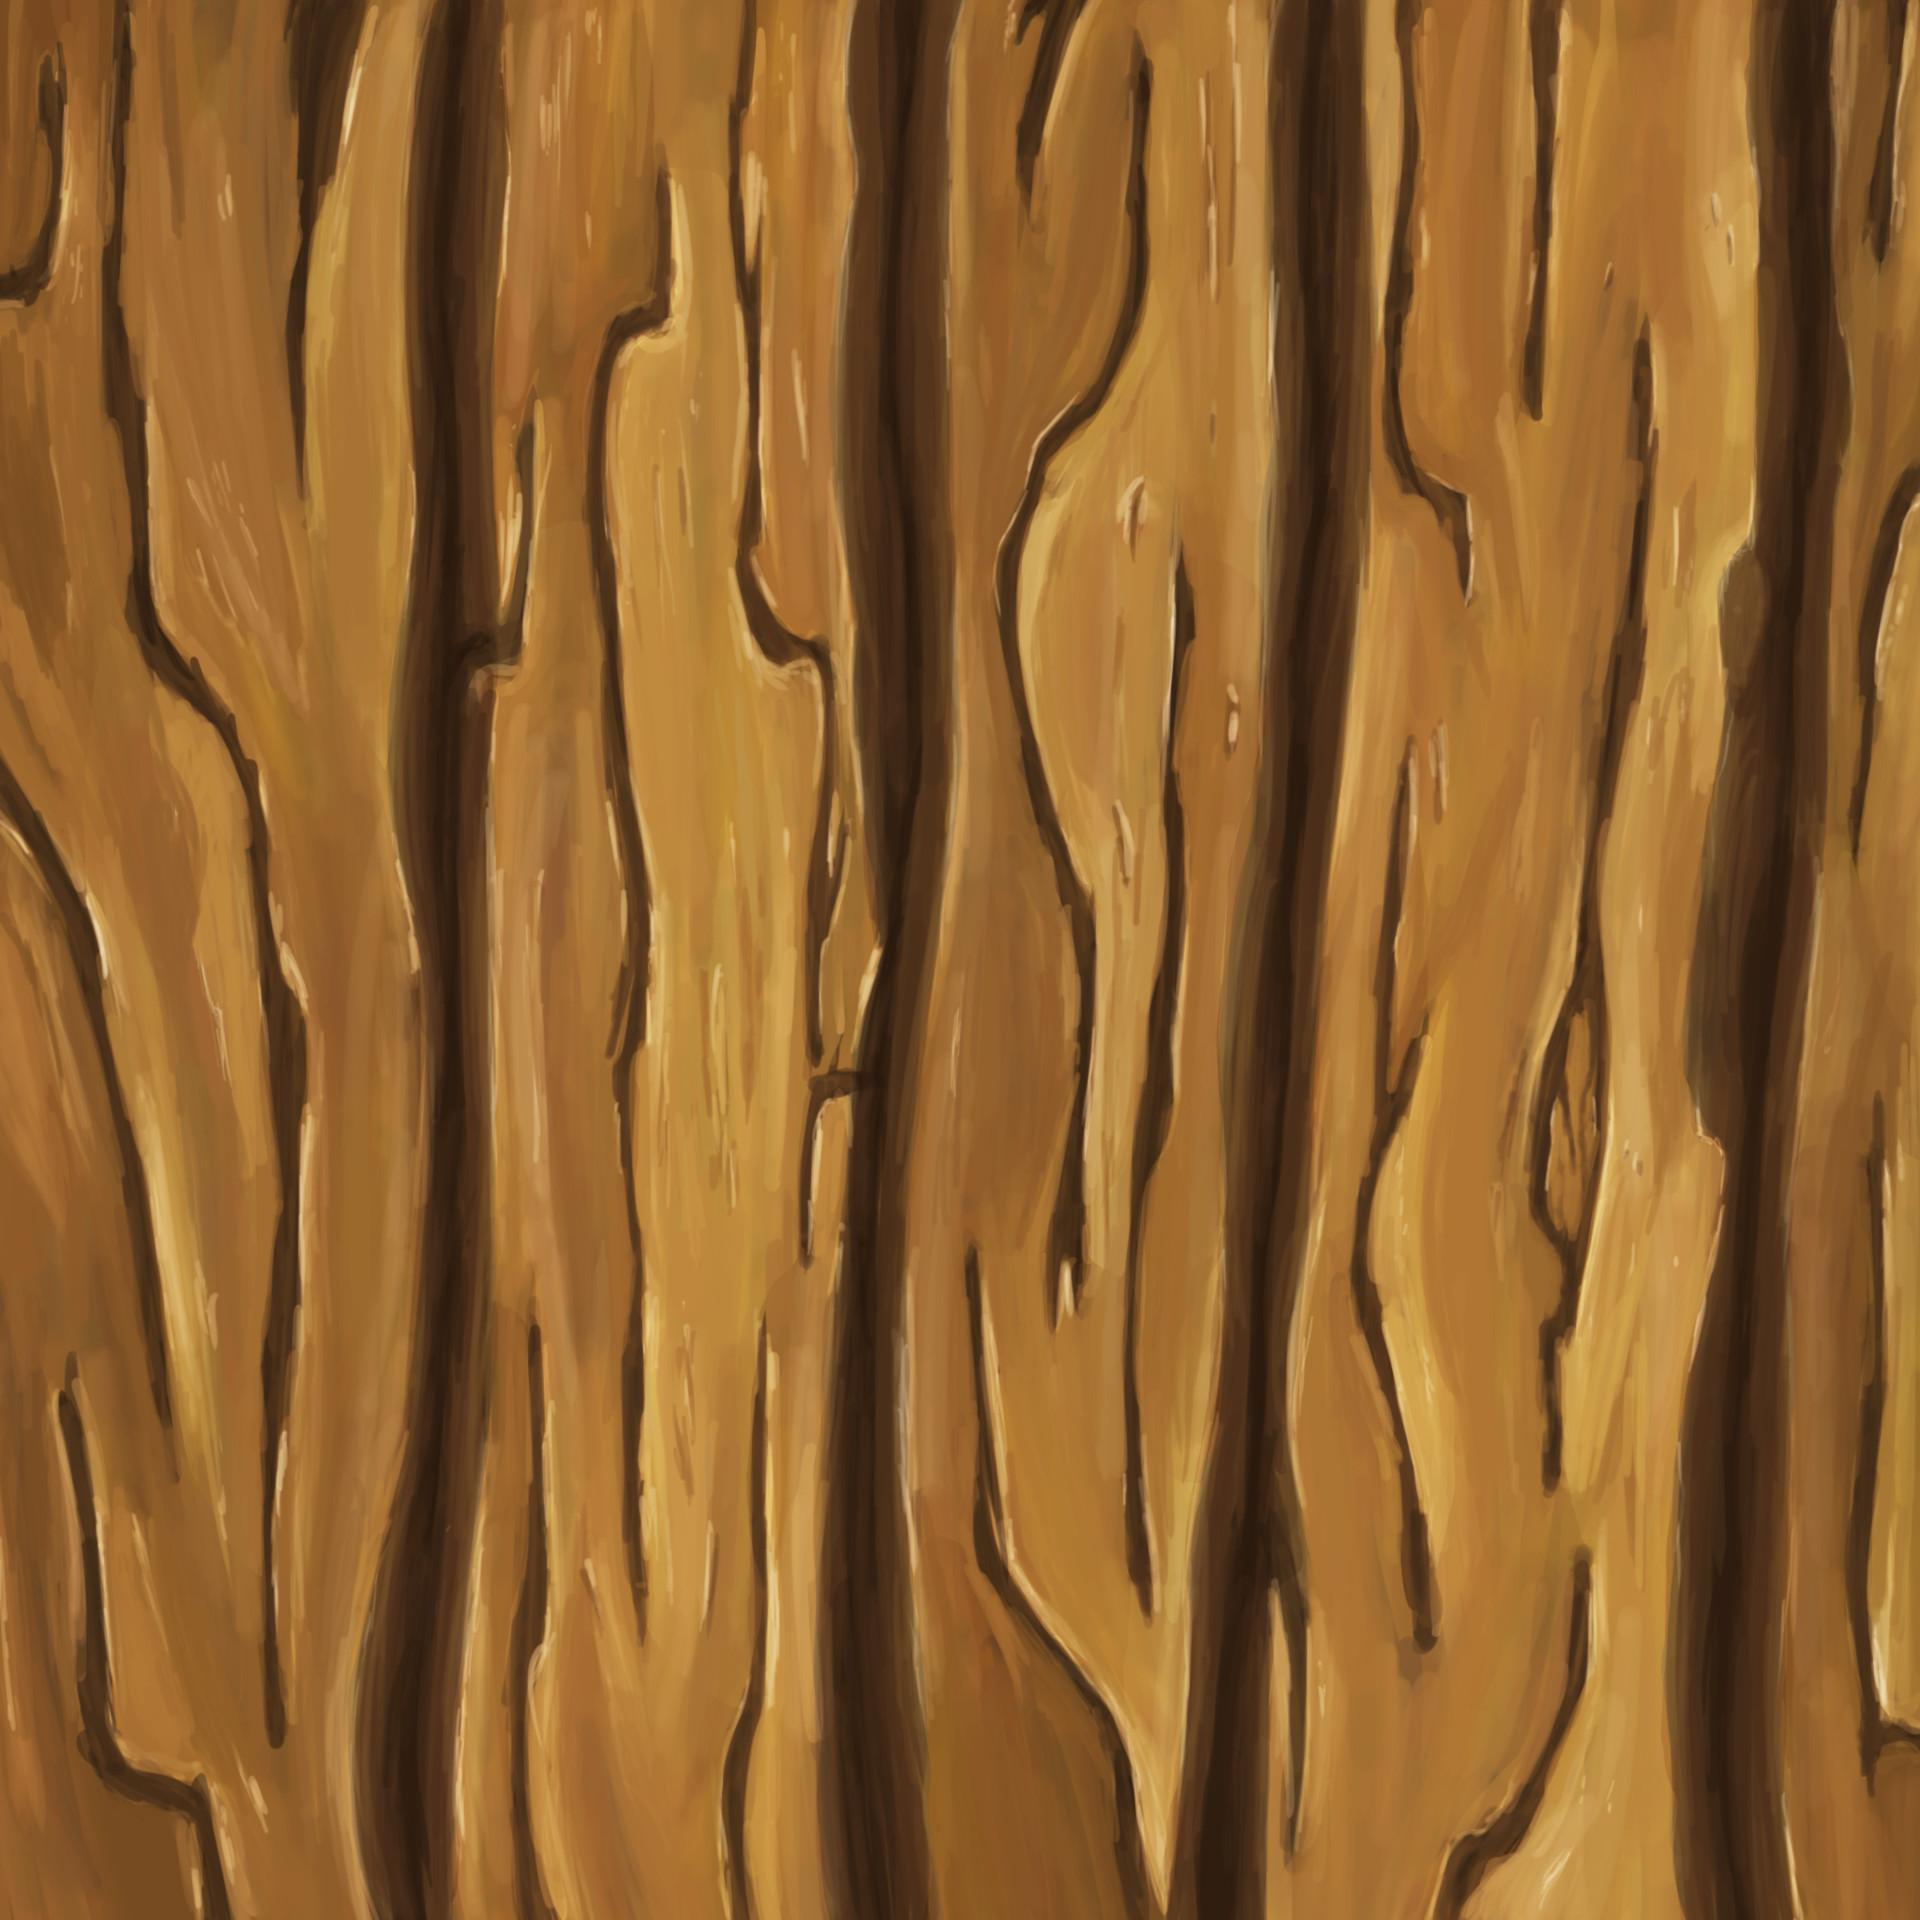 ArtStation Hand Painted Wood Texture Study Eric Carroll